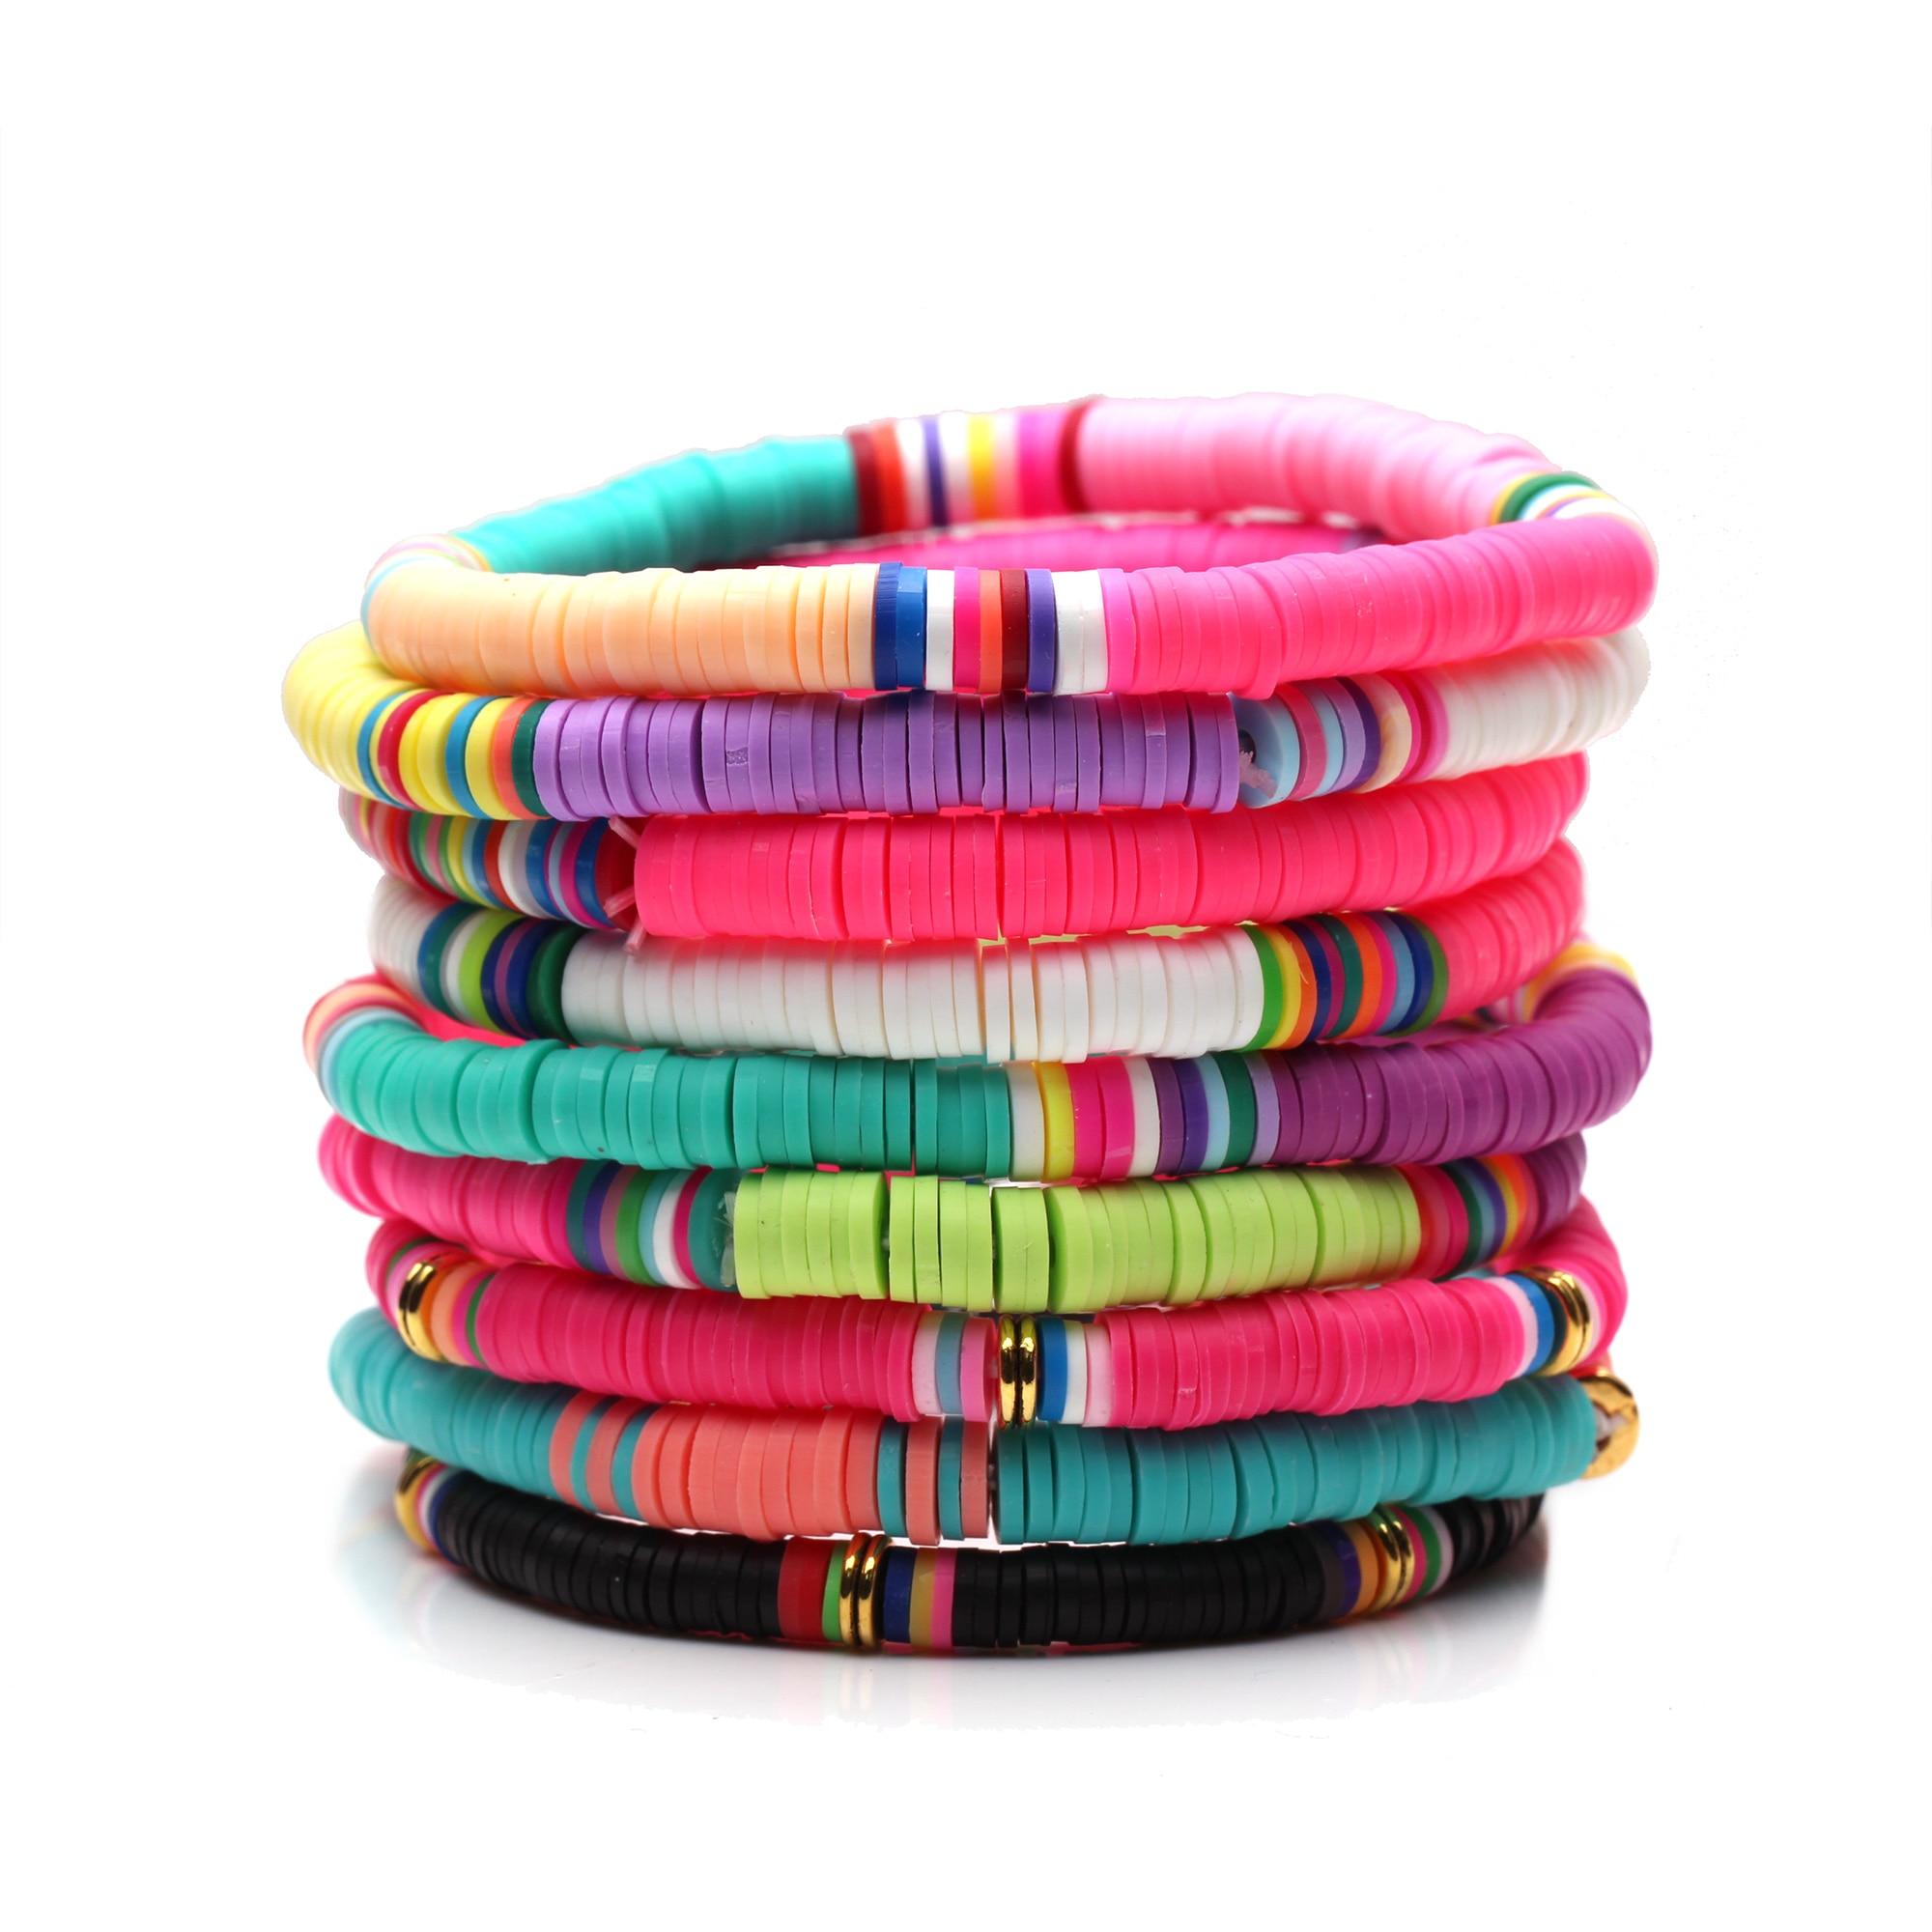 Multicolored Recyclable Polymer Clay Heishi Beads Stretch Bracelet Women Men Boho Pretty Cute Summer Beach Surf Jewelry Present